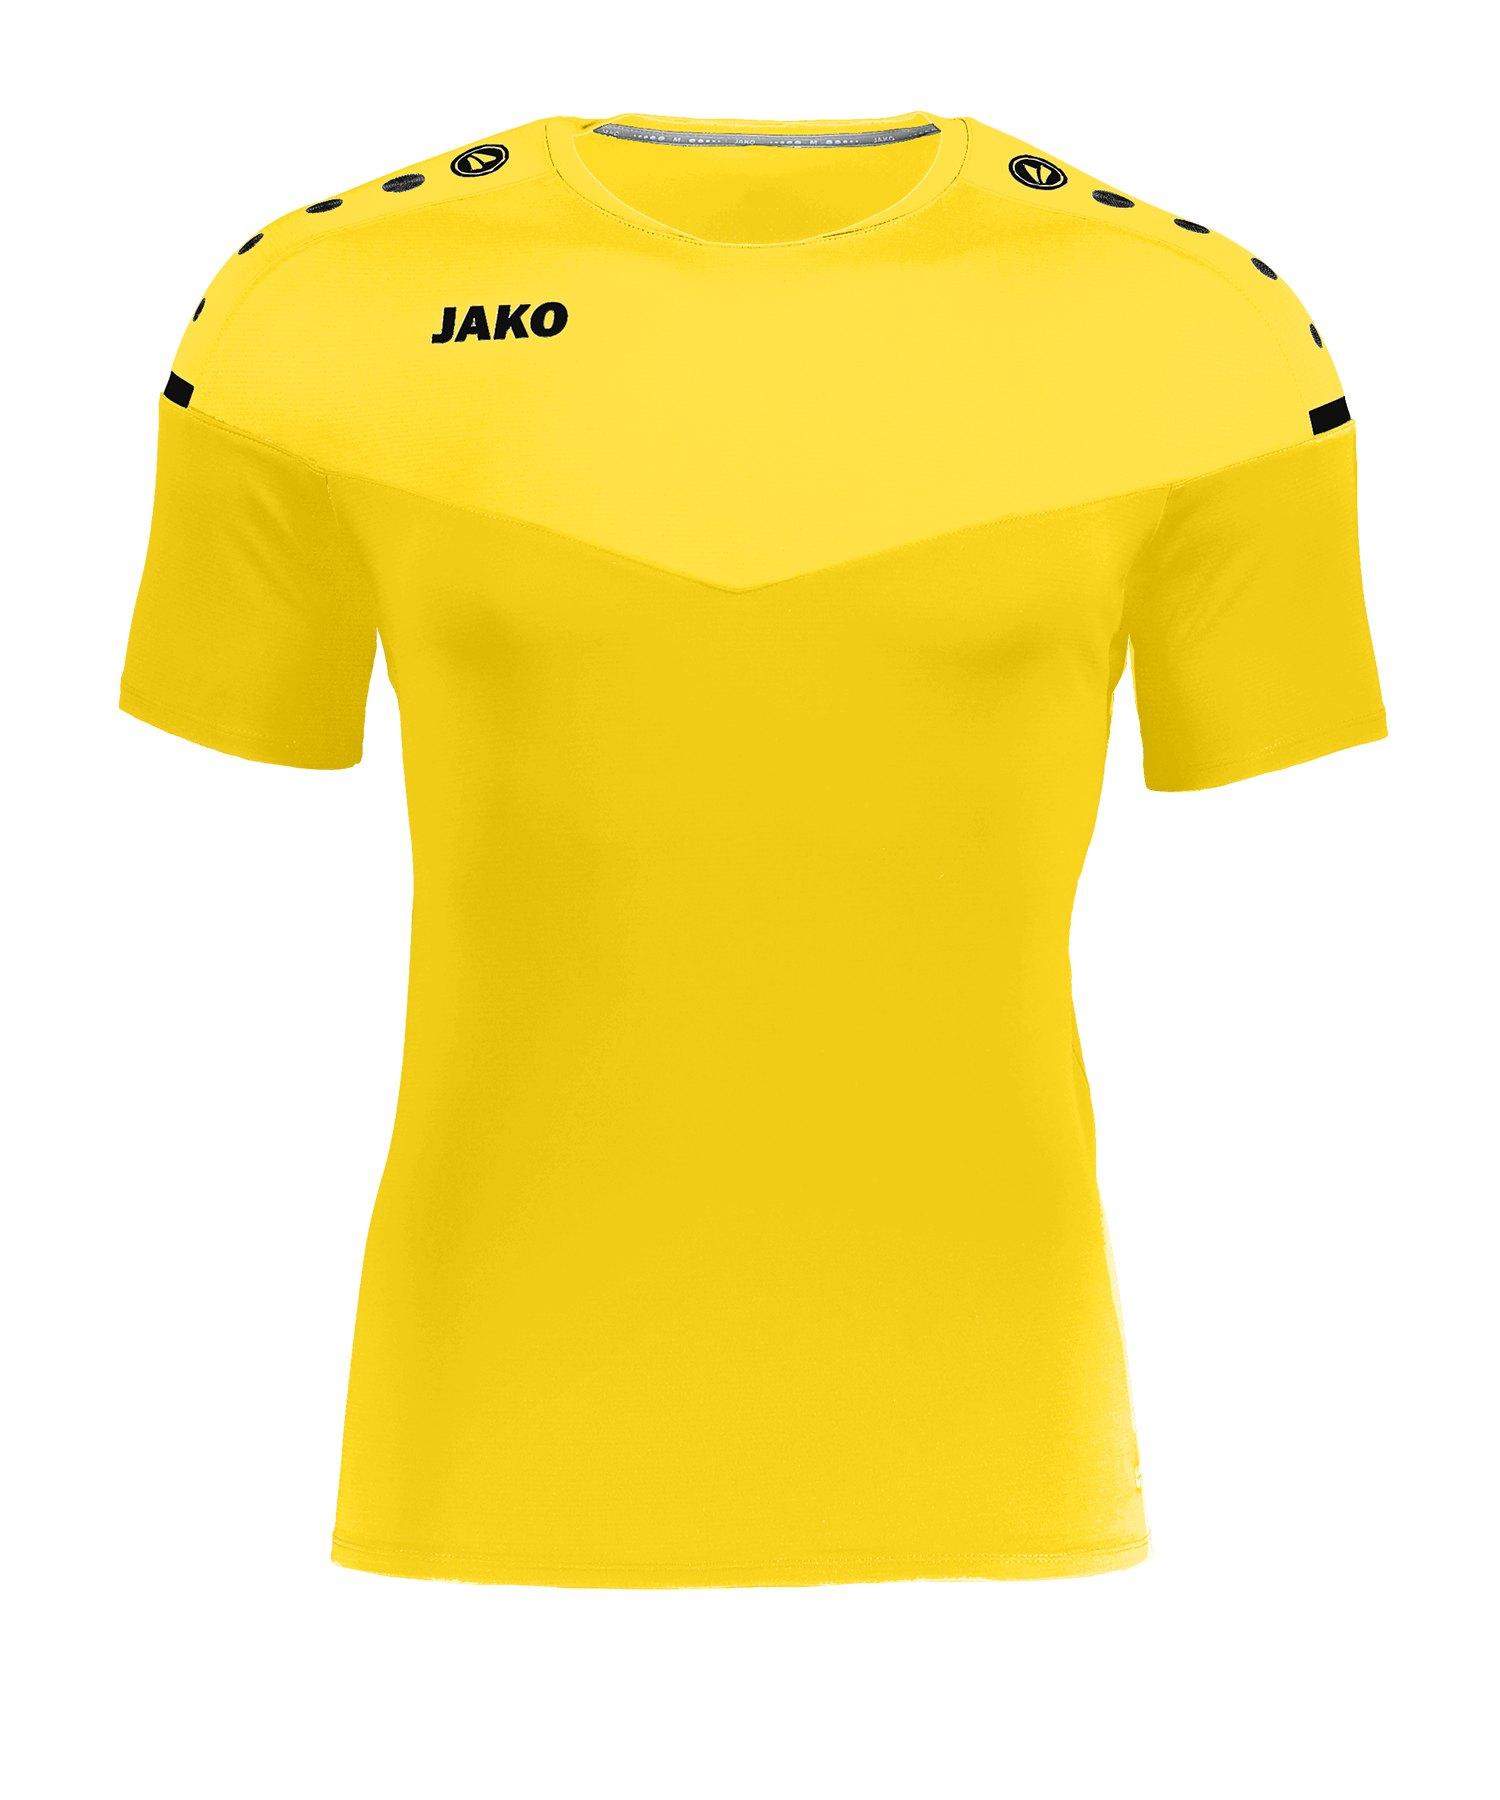 Jako Champ 2.0 T-Shirt Damen Gelb F03 - gelb